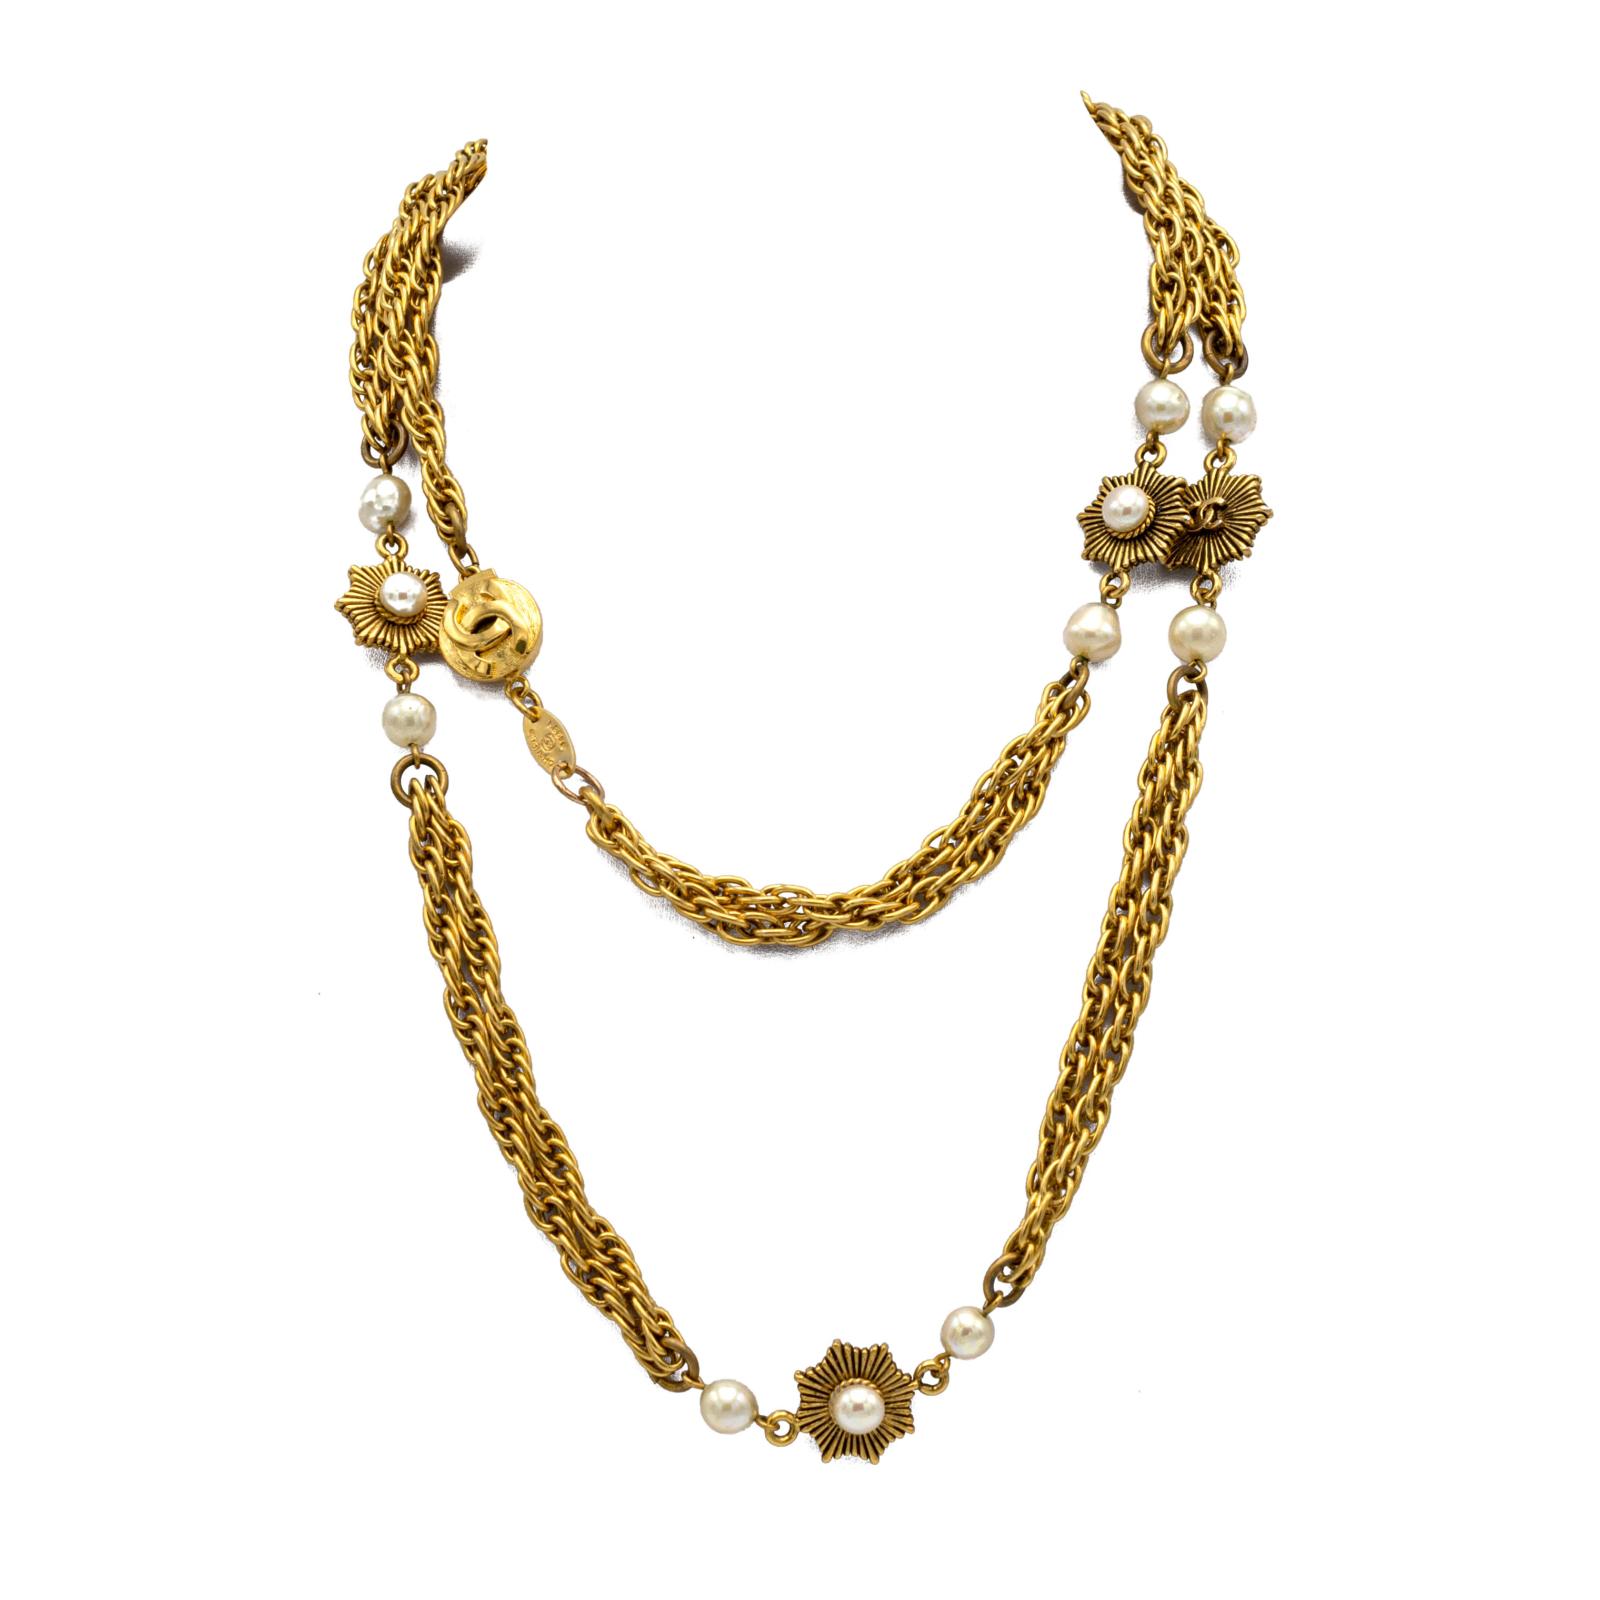 "Chanel 38"" Double Strand Sunburst & Pearl Necklace, 1984"